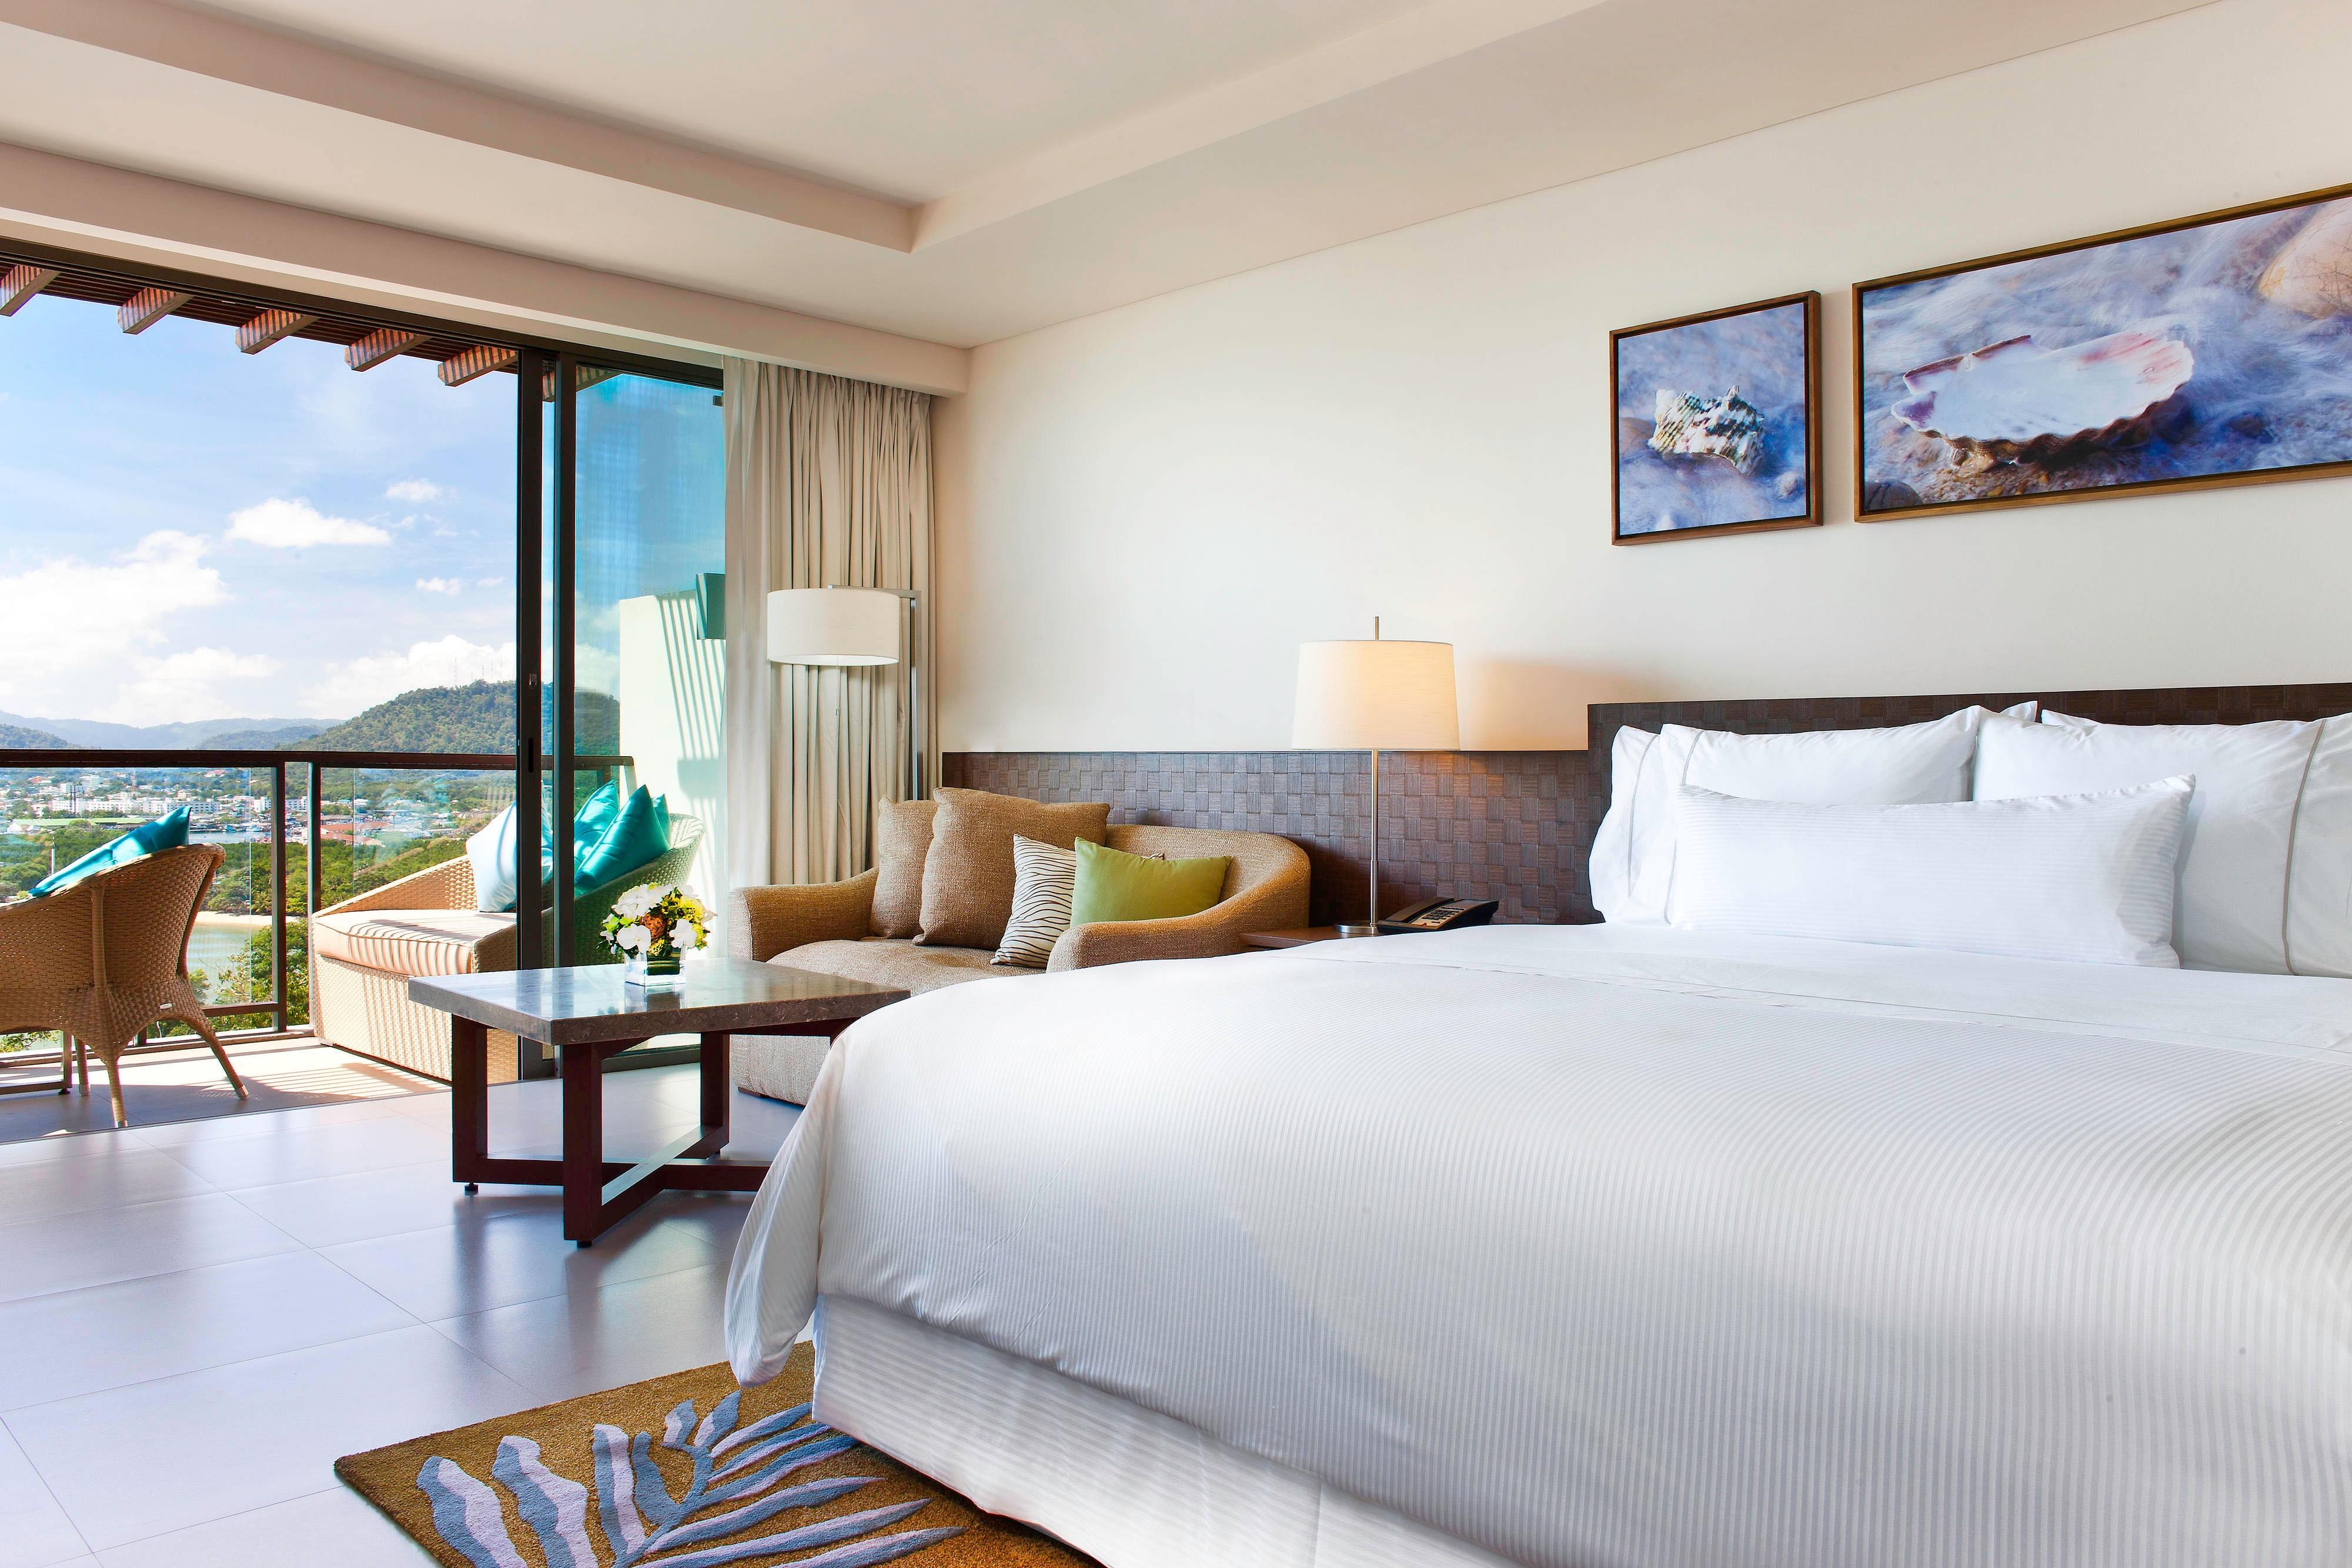 Quarto Sea View Superior - cama Heavenly